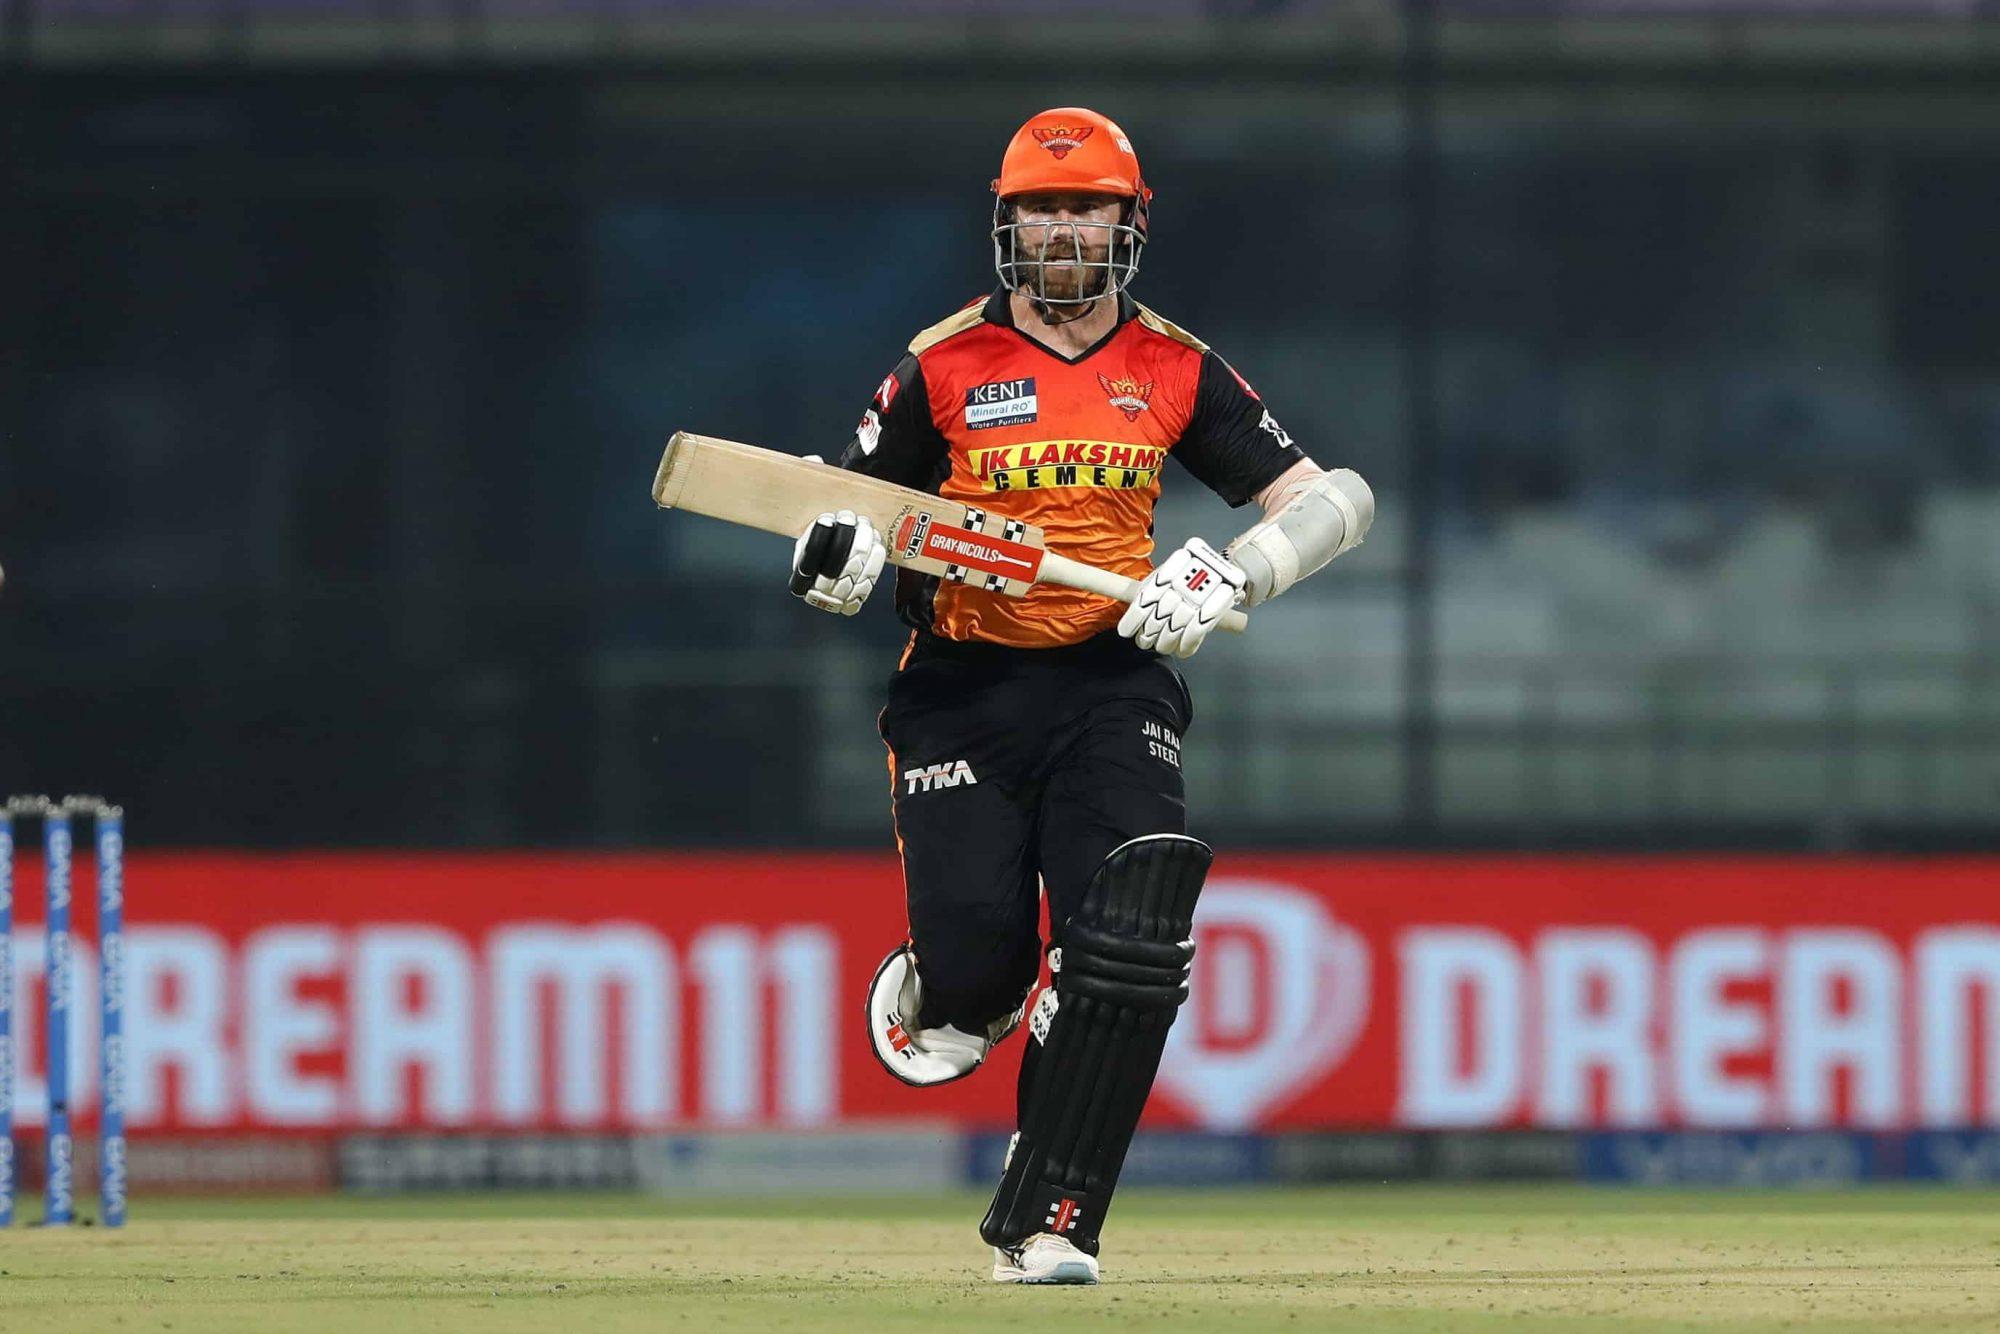 Kane Williamson Replacing David Warner to Lead SRH for Remainder of IPL 2021